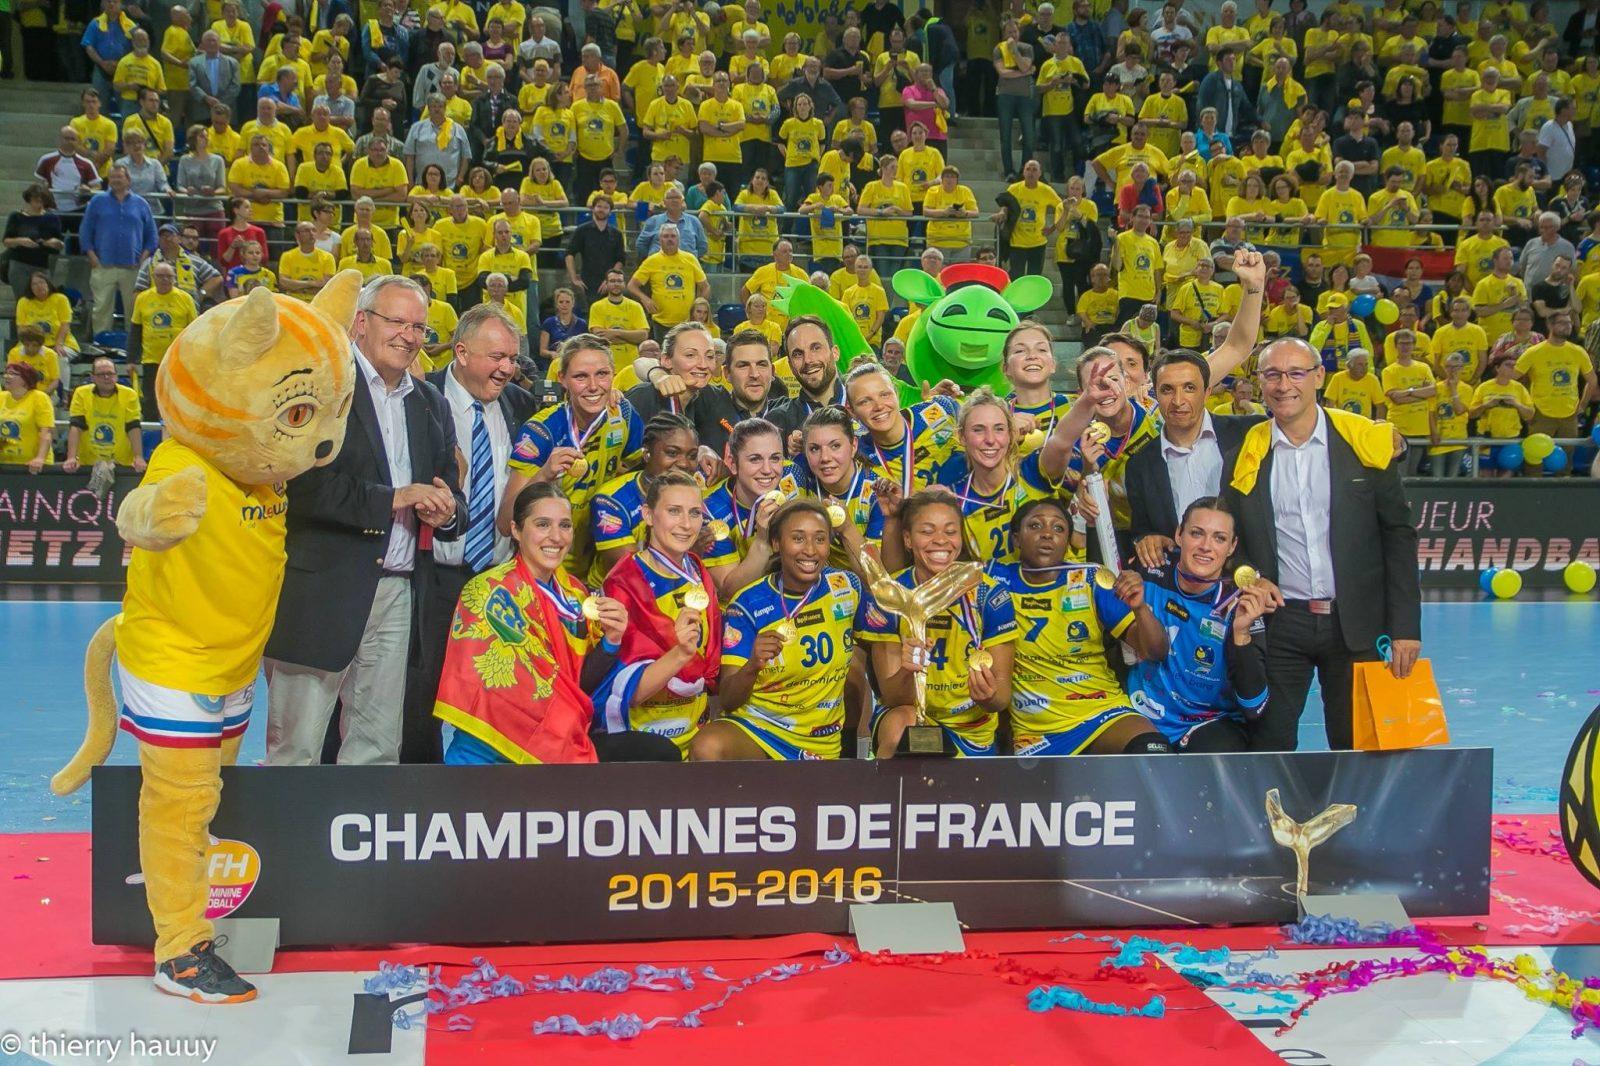 Les joueuses du Metz Handball défilent dans les rues de Metz